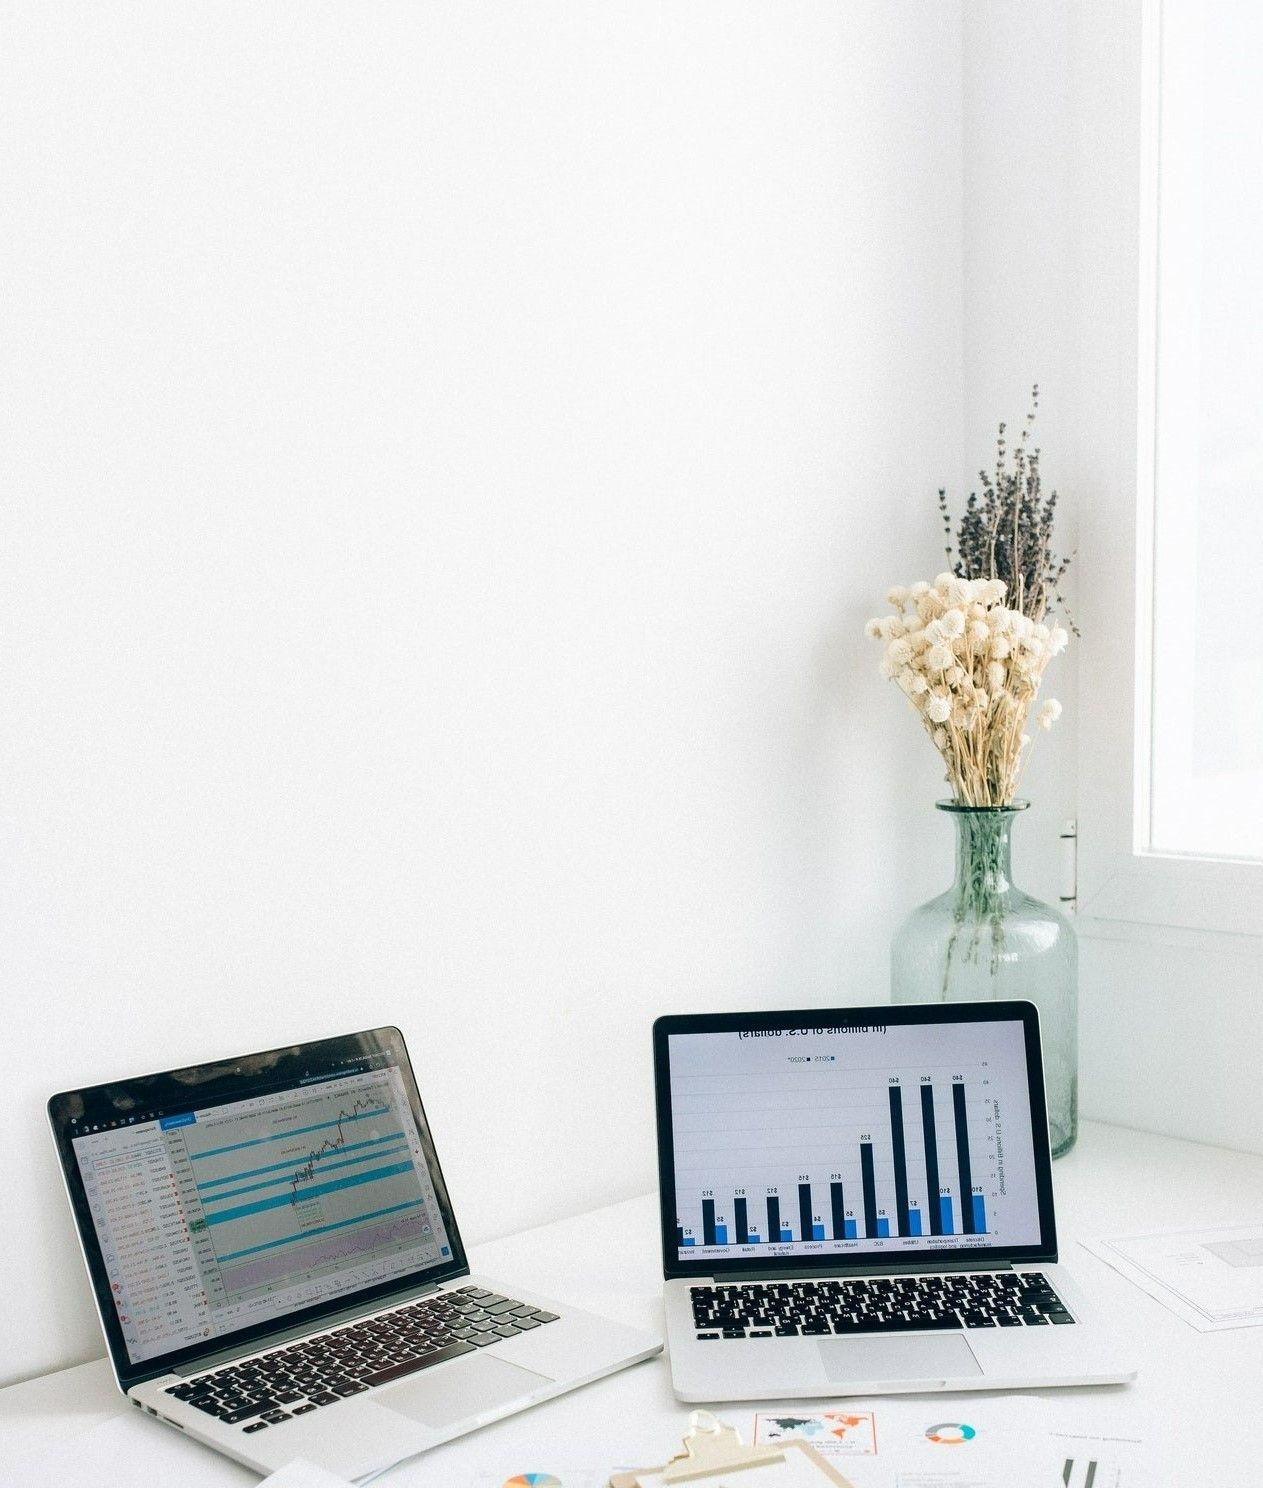 Картинка где в офисе на столе лежат два ноутбука с изображением графиков на мониторе